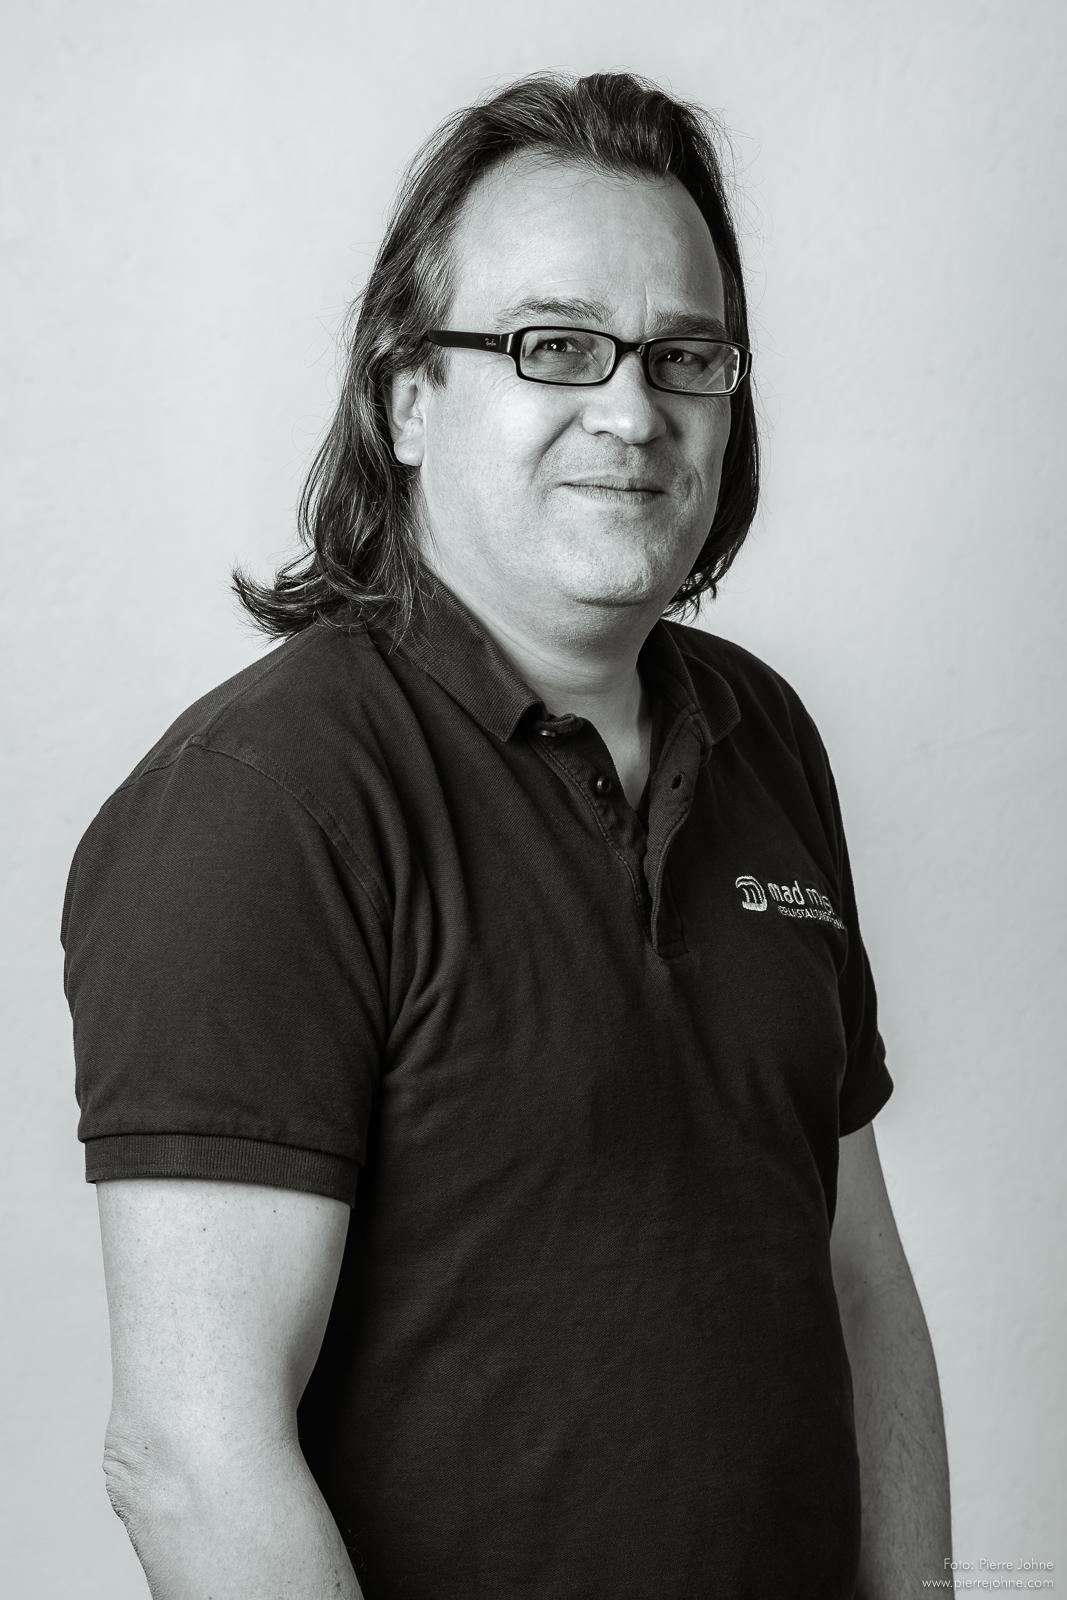 Stepan Baumgartner